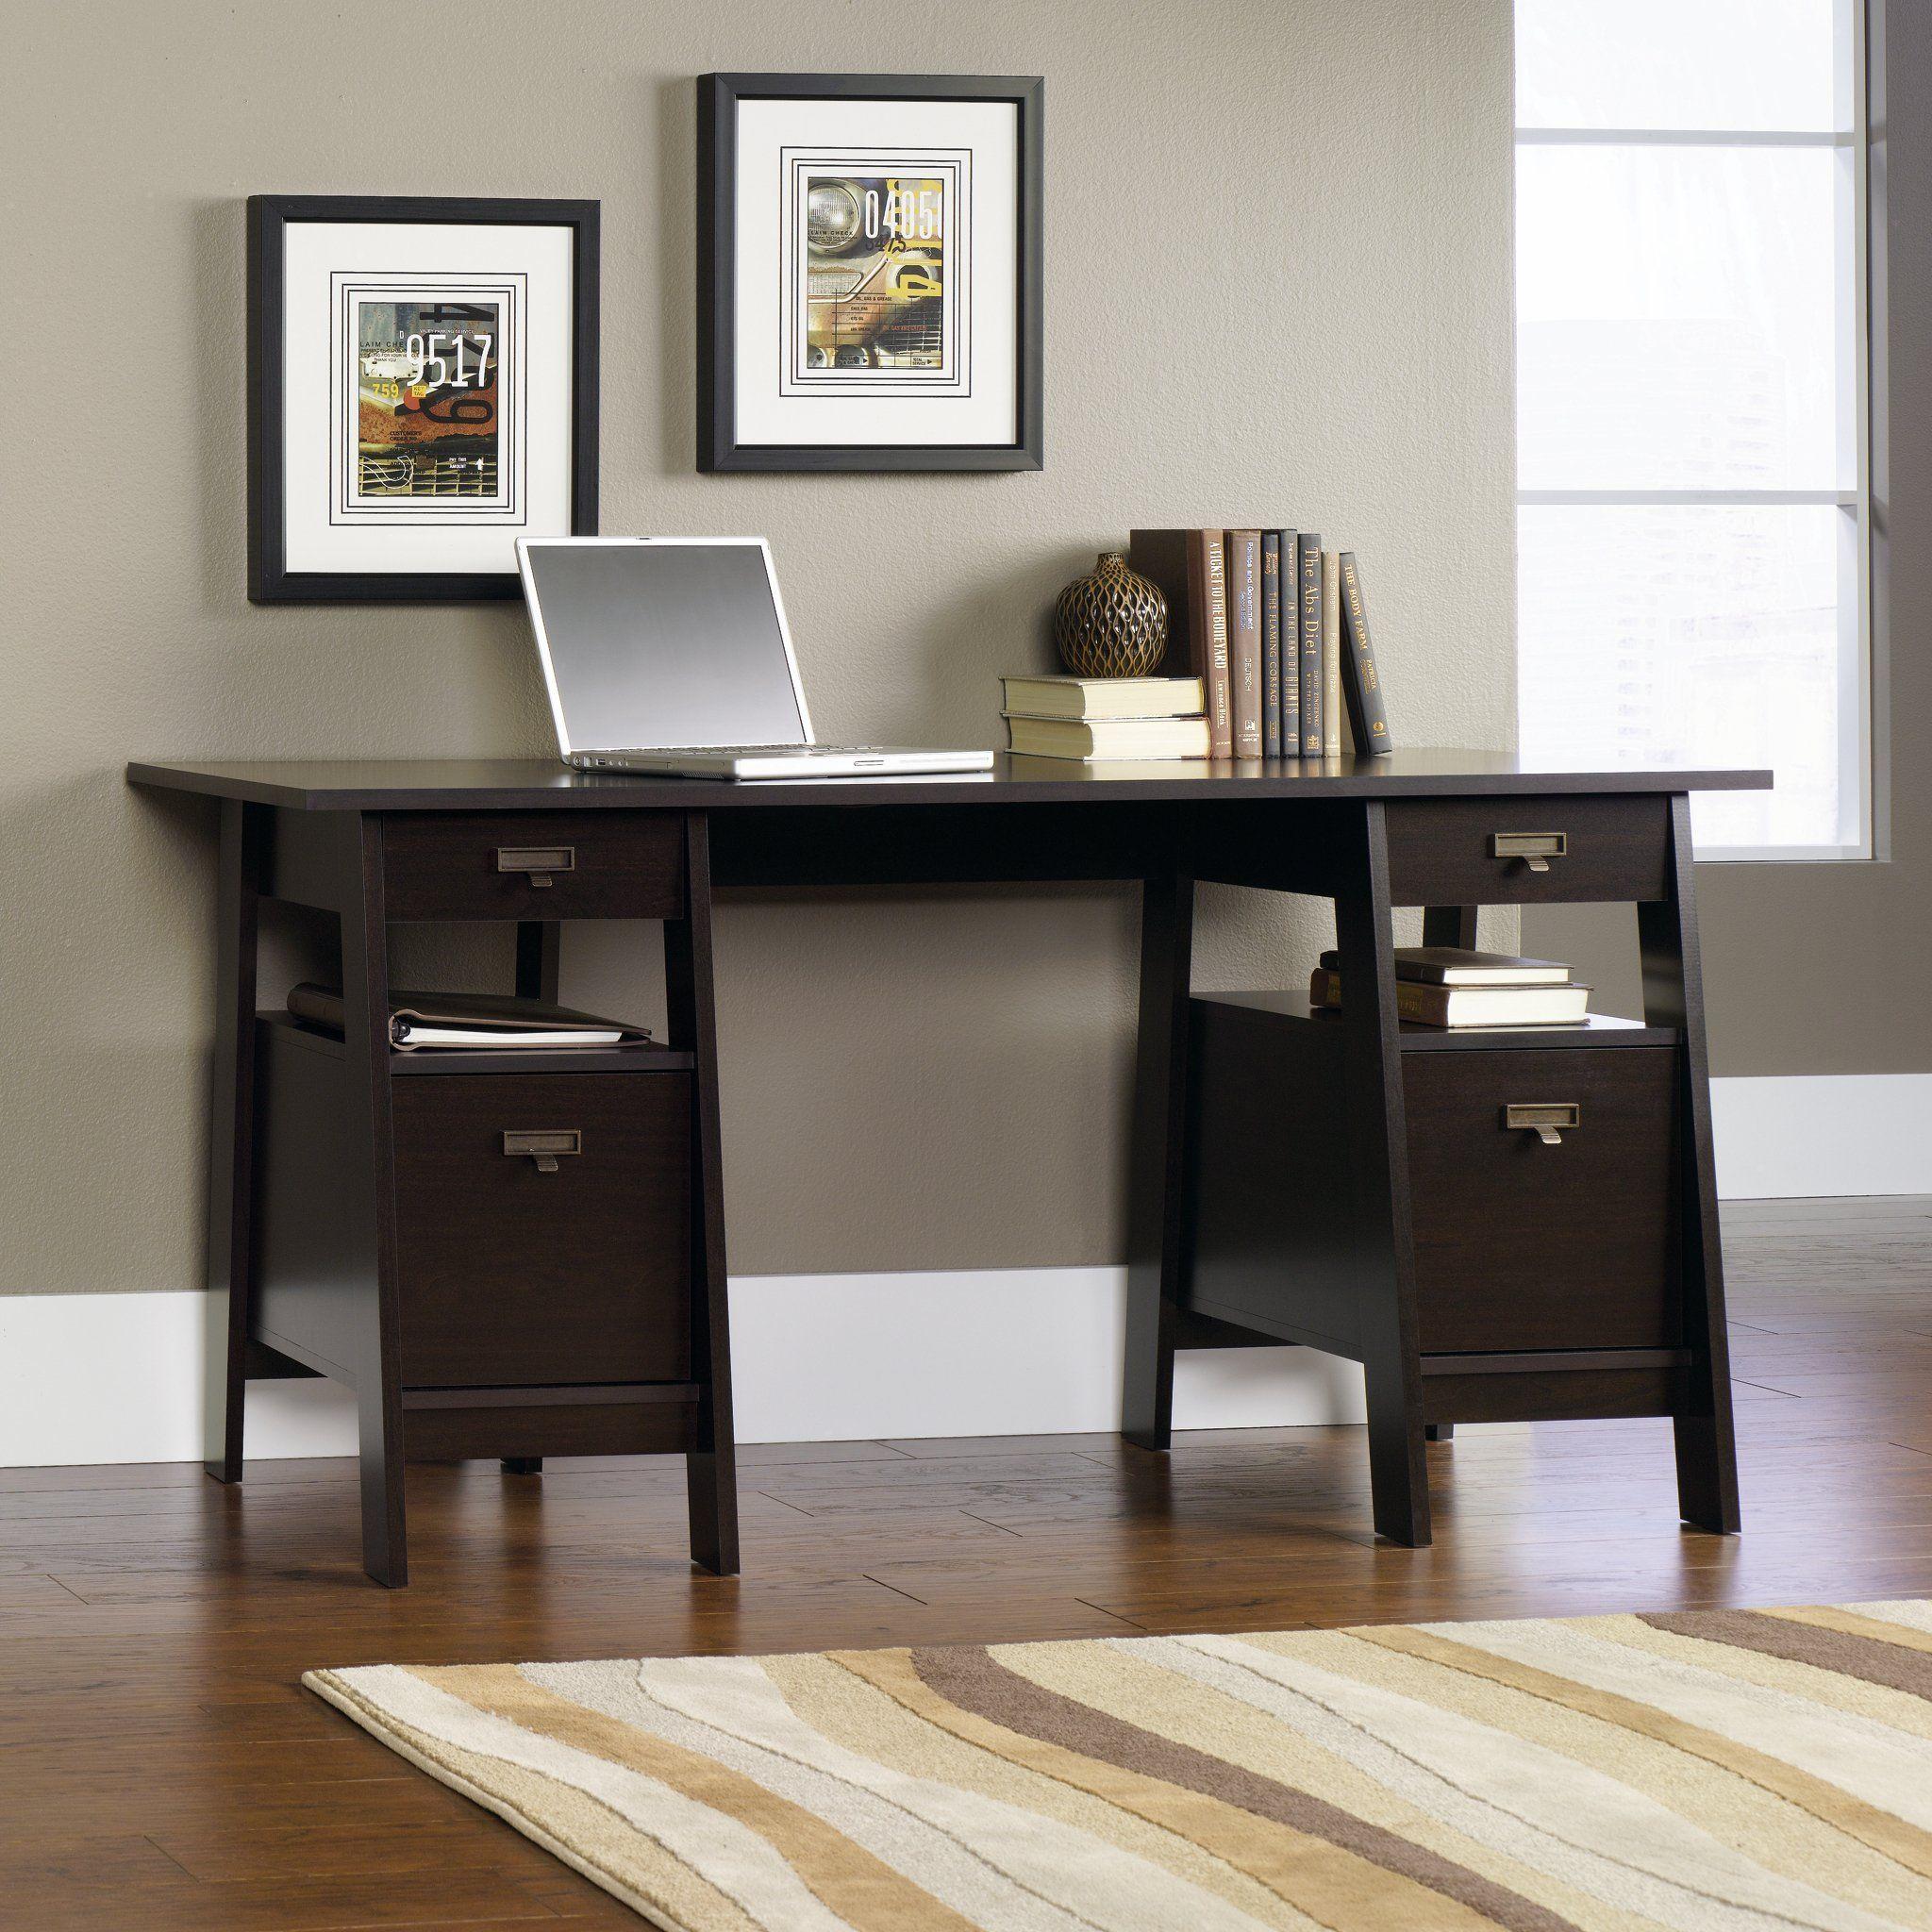 Jamocha Executive Trestle Desk Stockbridge Home office